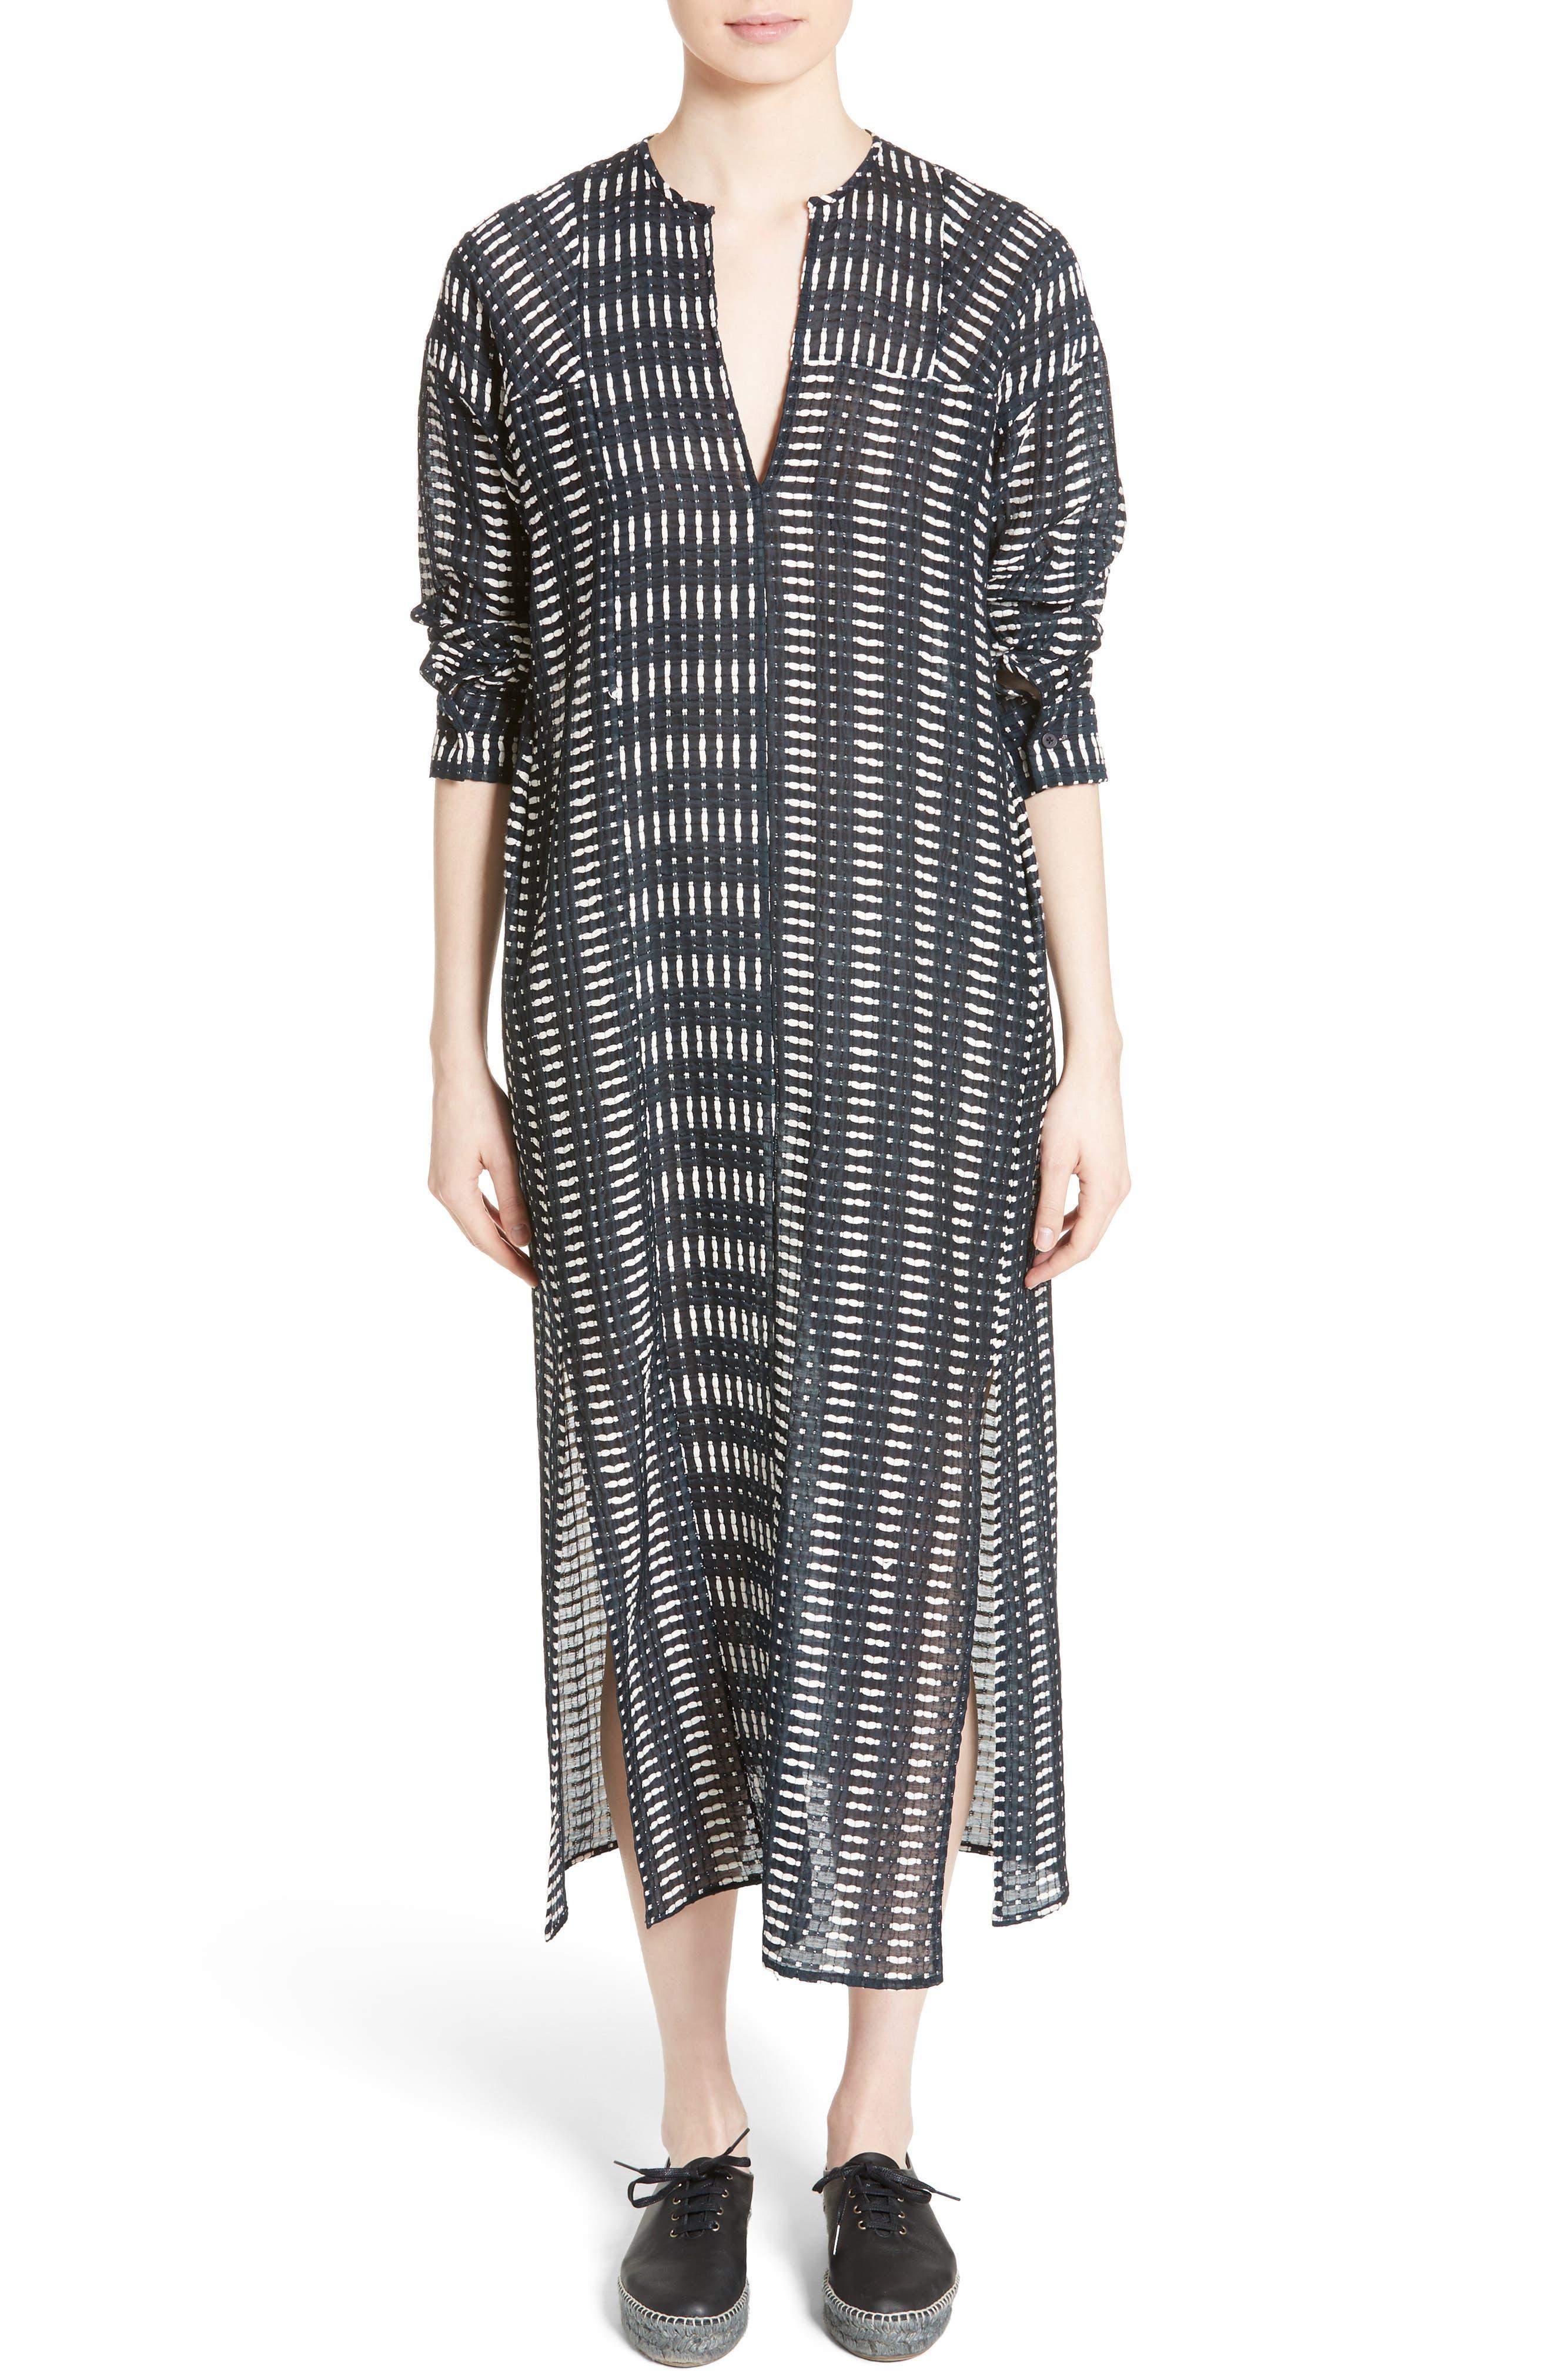 Main Image - Zero + Maria Cornejo Ire DNA Remix Dress